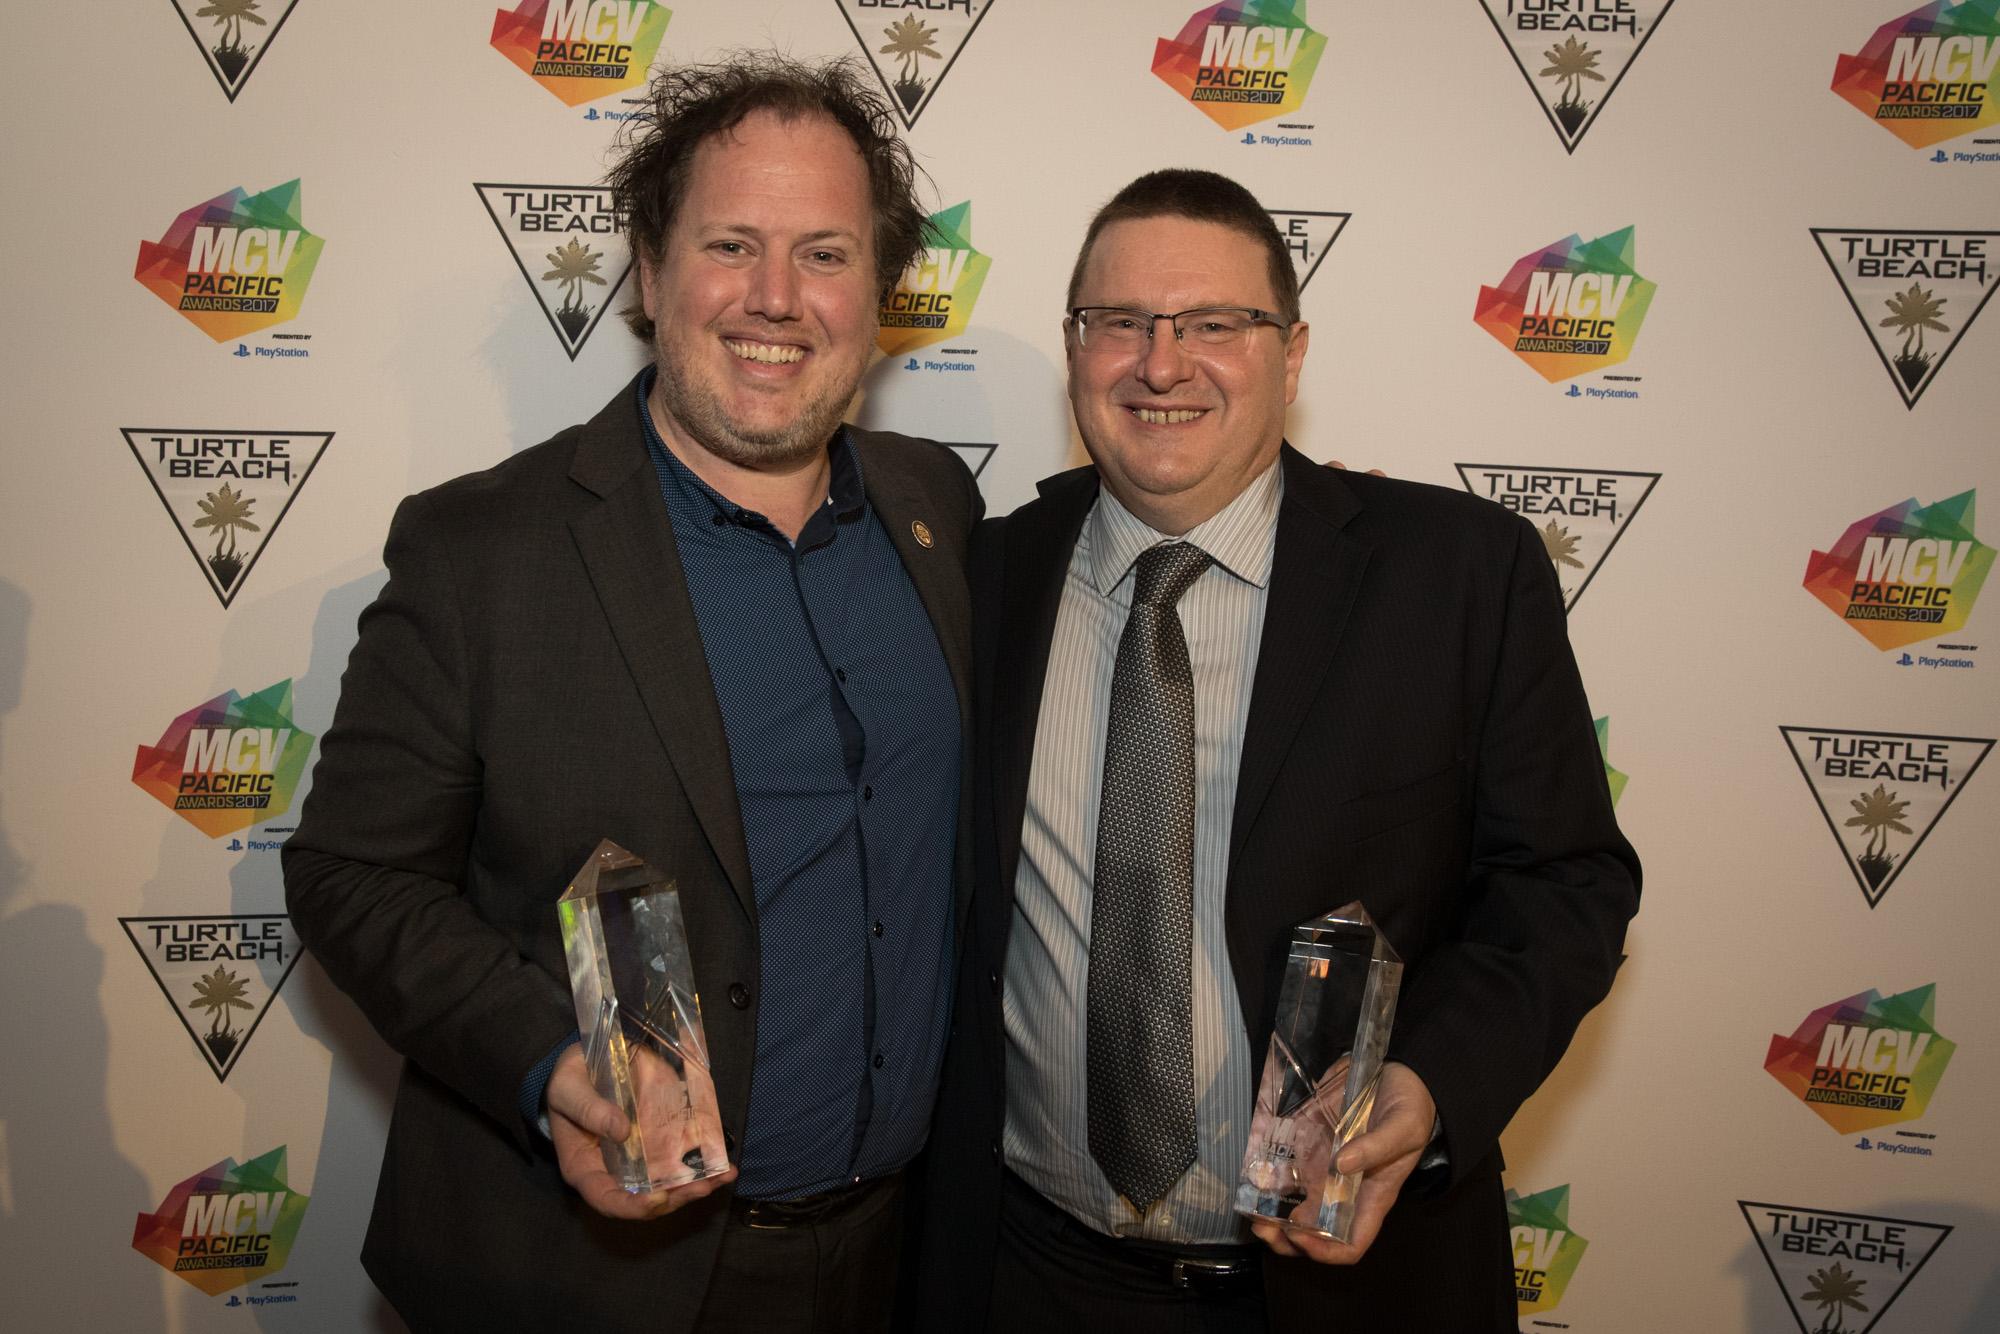 MCV_Pacific_Awards_1_June_17_PS_216.jpg